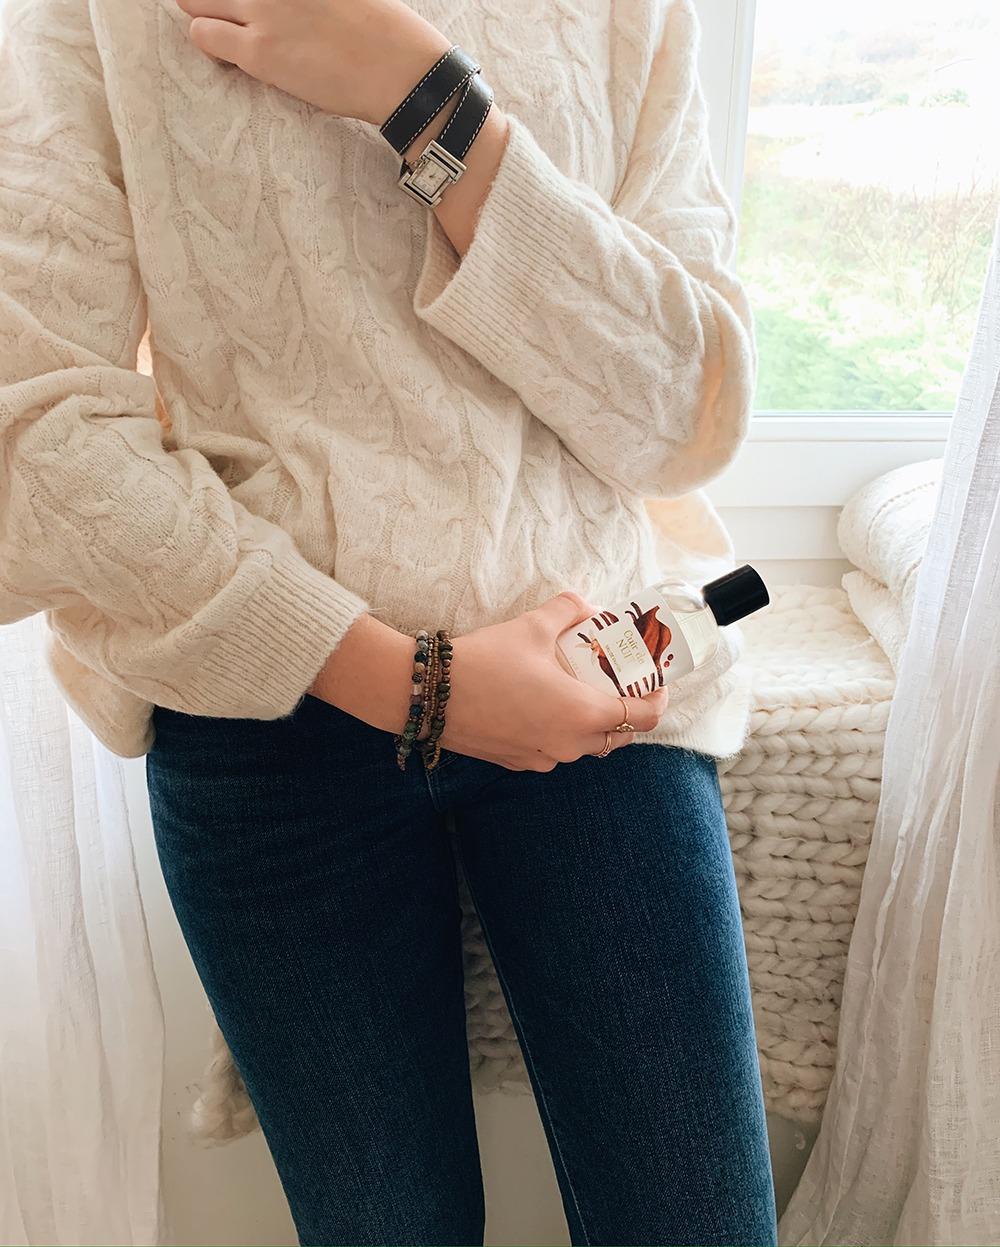 parfum yves rocher 02 s